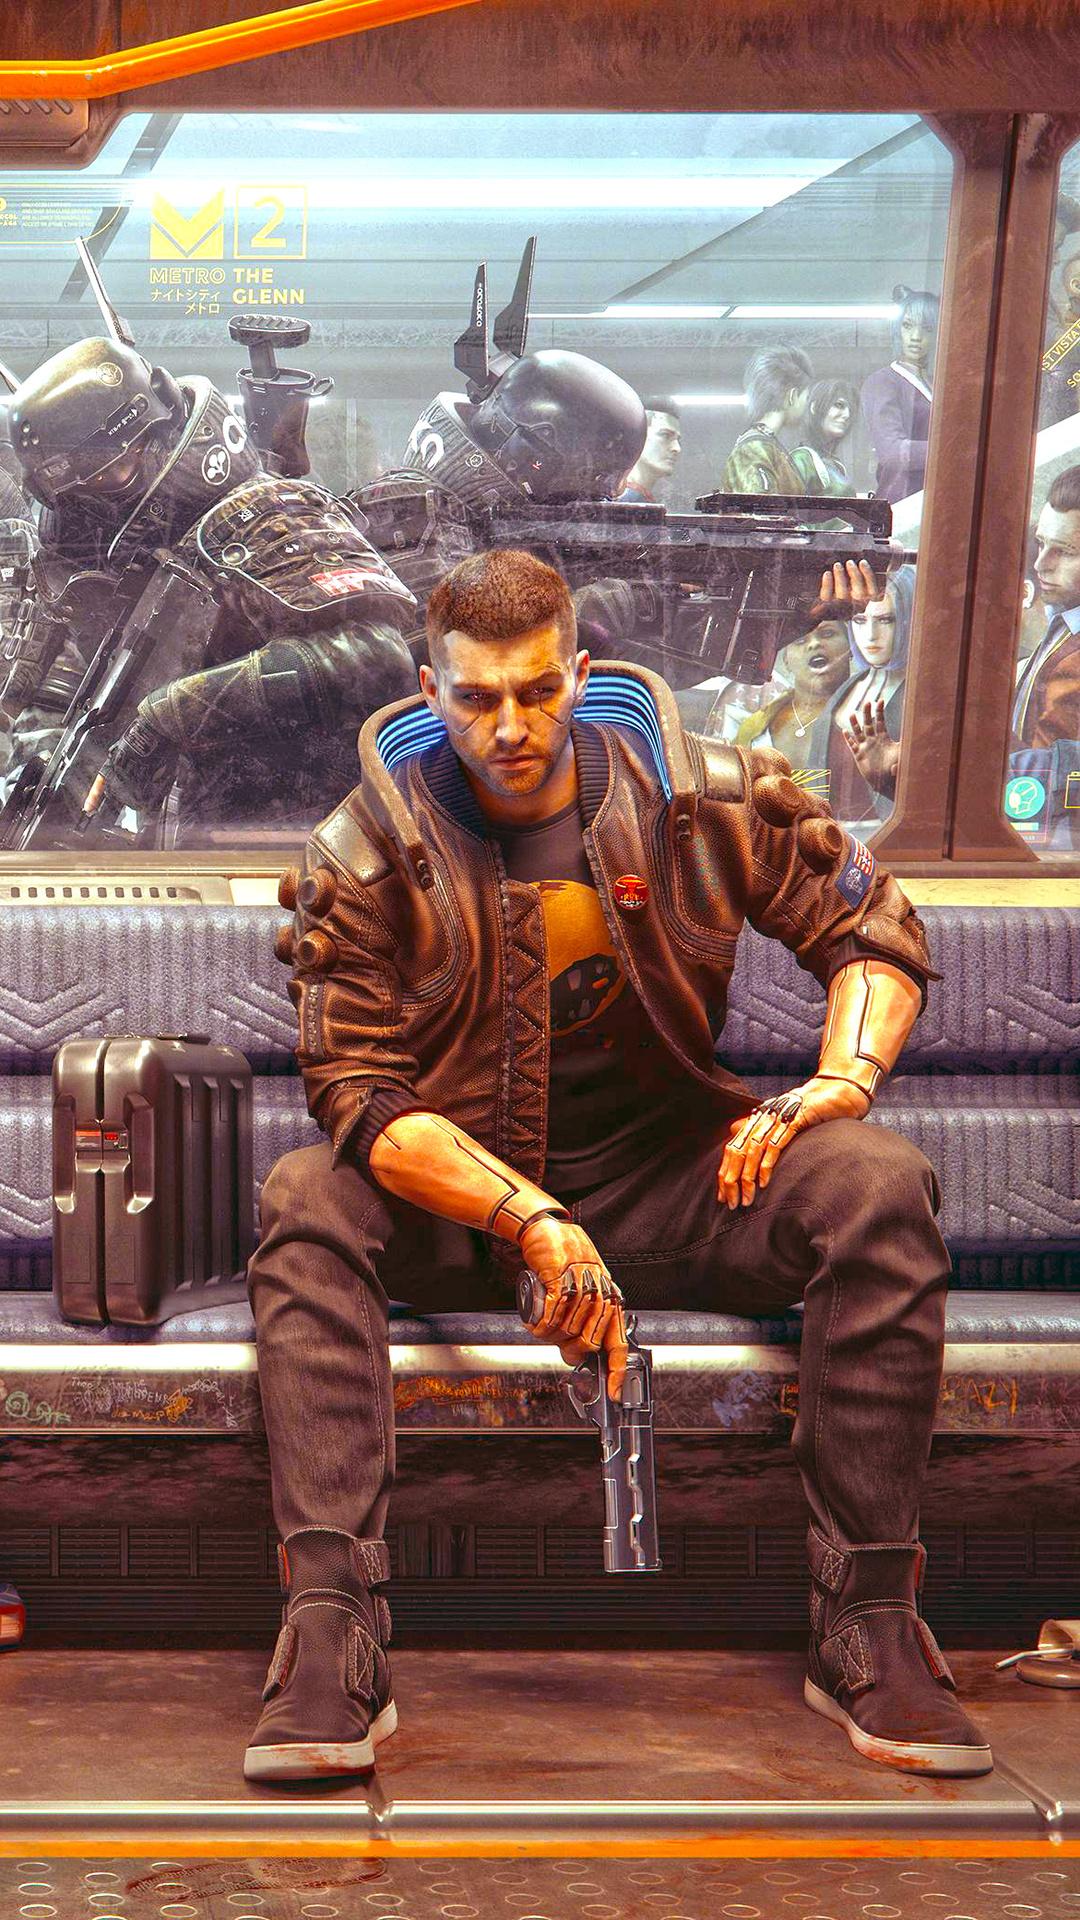 1080x1920 Cyberpunk 2077 Train Station 4k Iphone 7,6s,6 ...